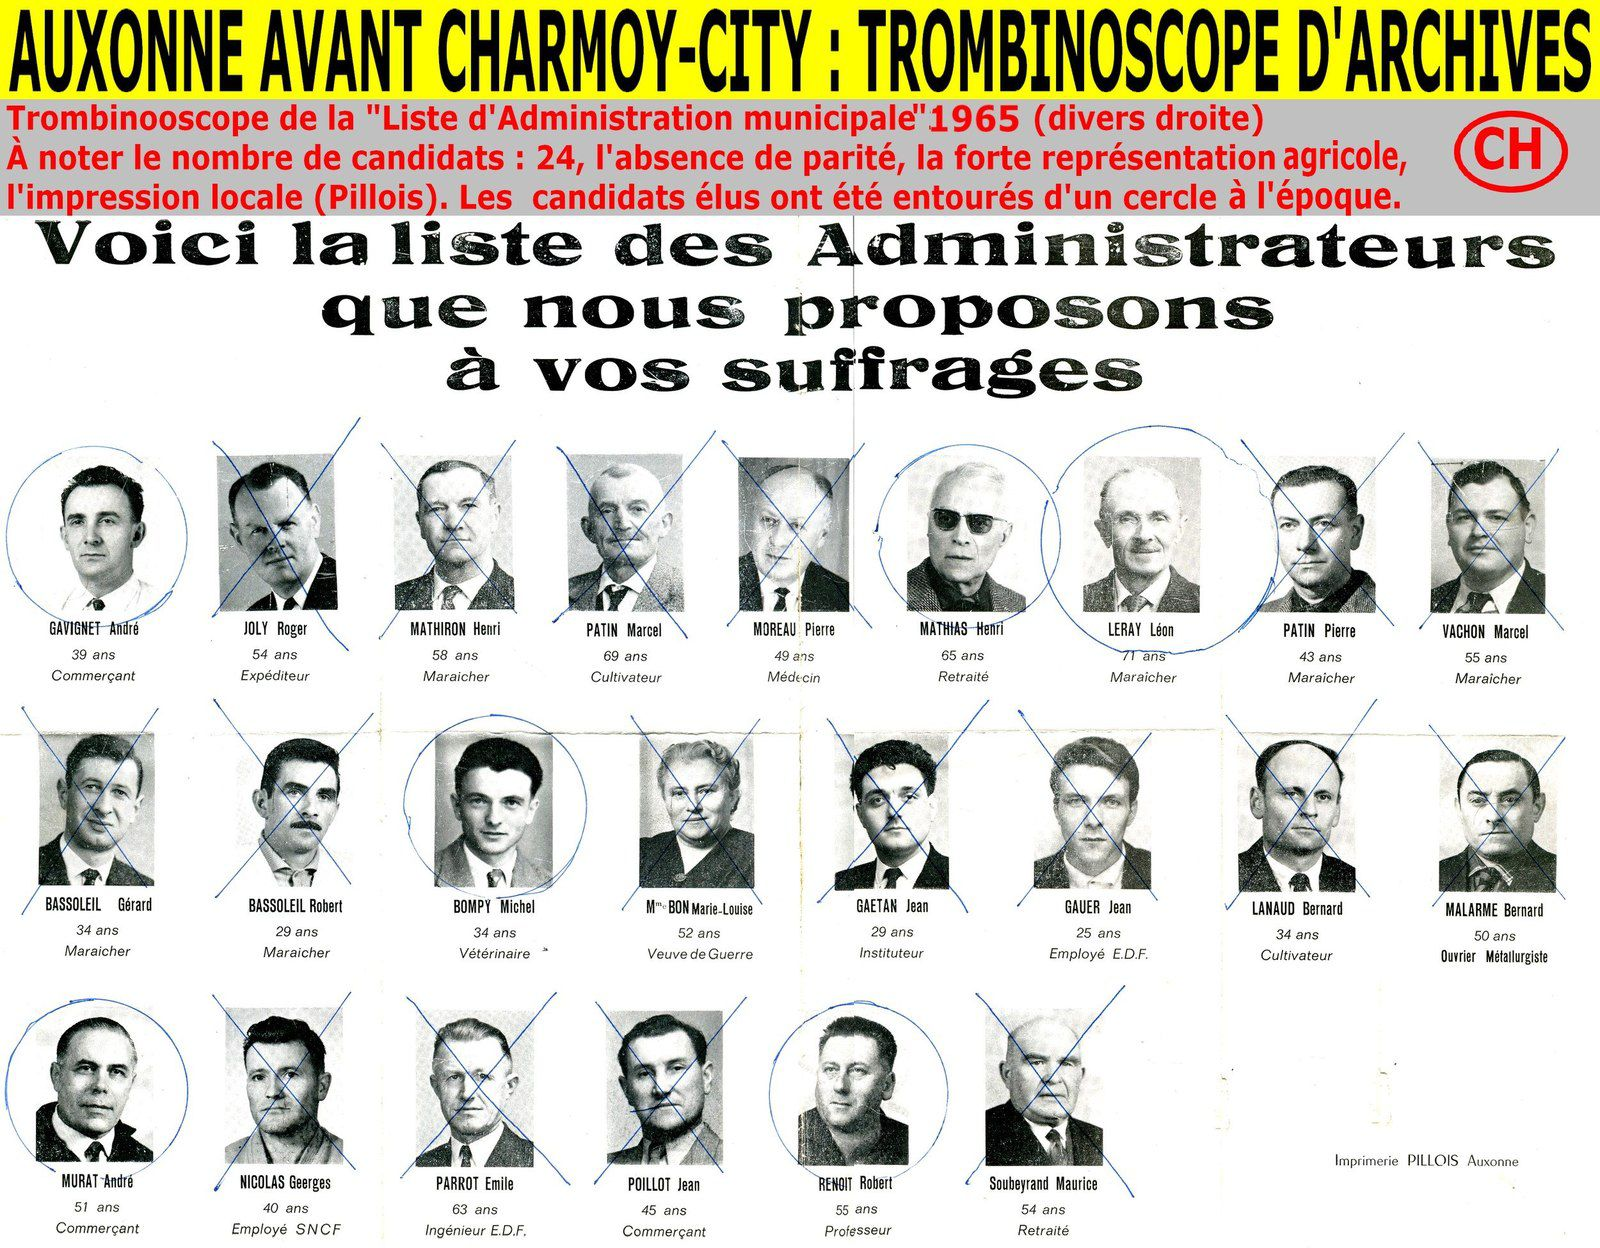 Auxonne avant Charmoy-City, trombinoscope d'archives.jpg